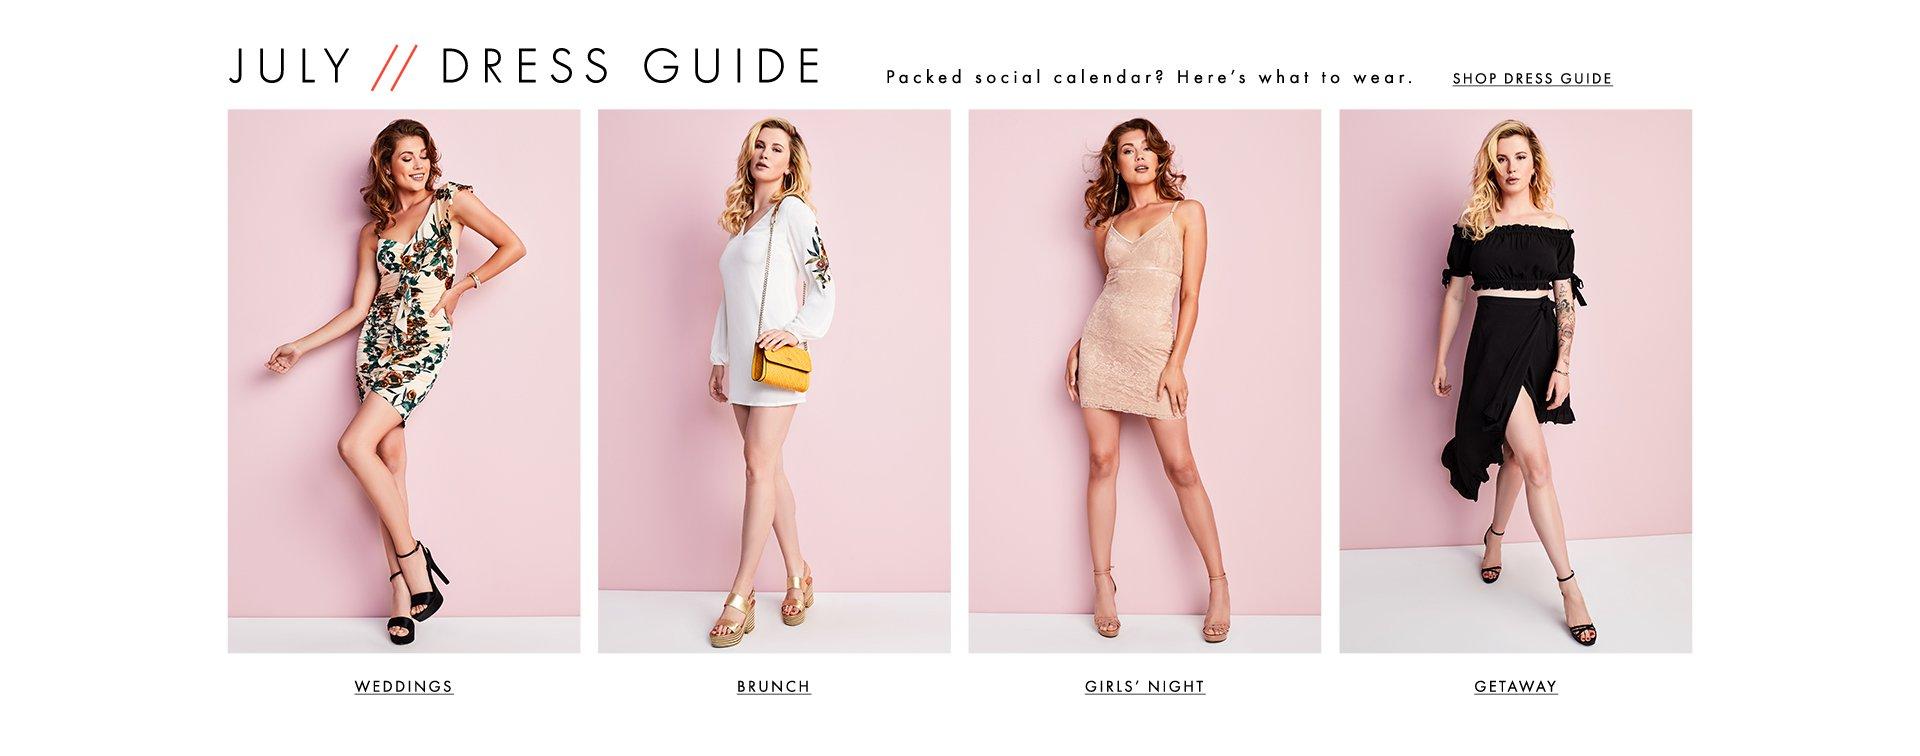 Shop Dress Guide